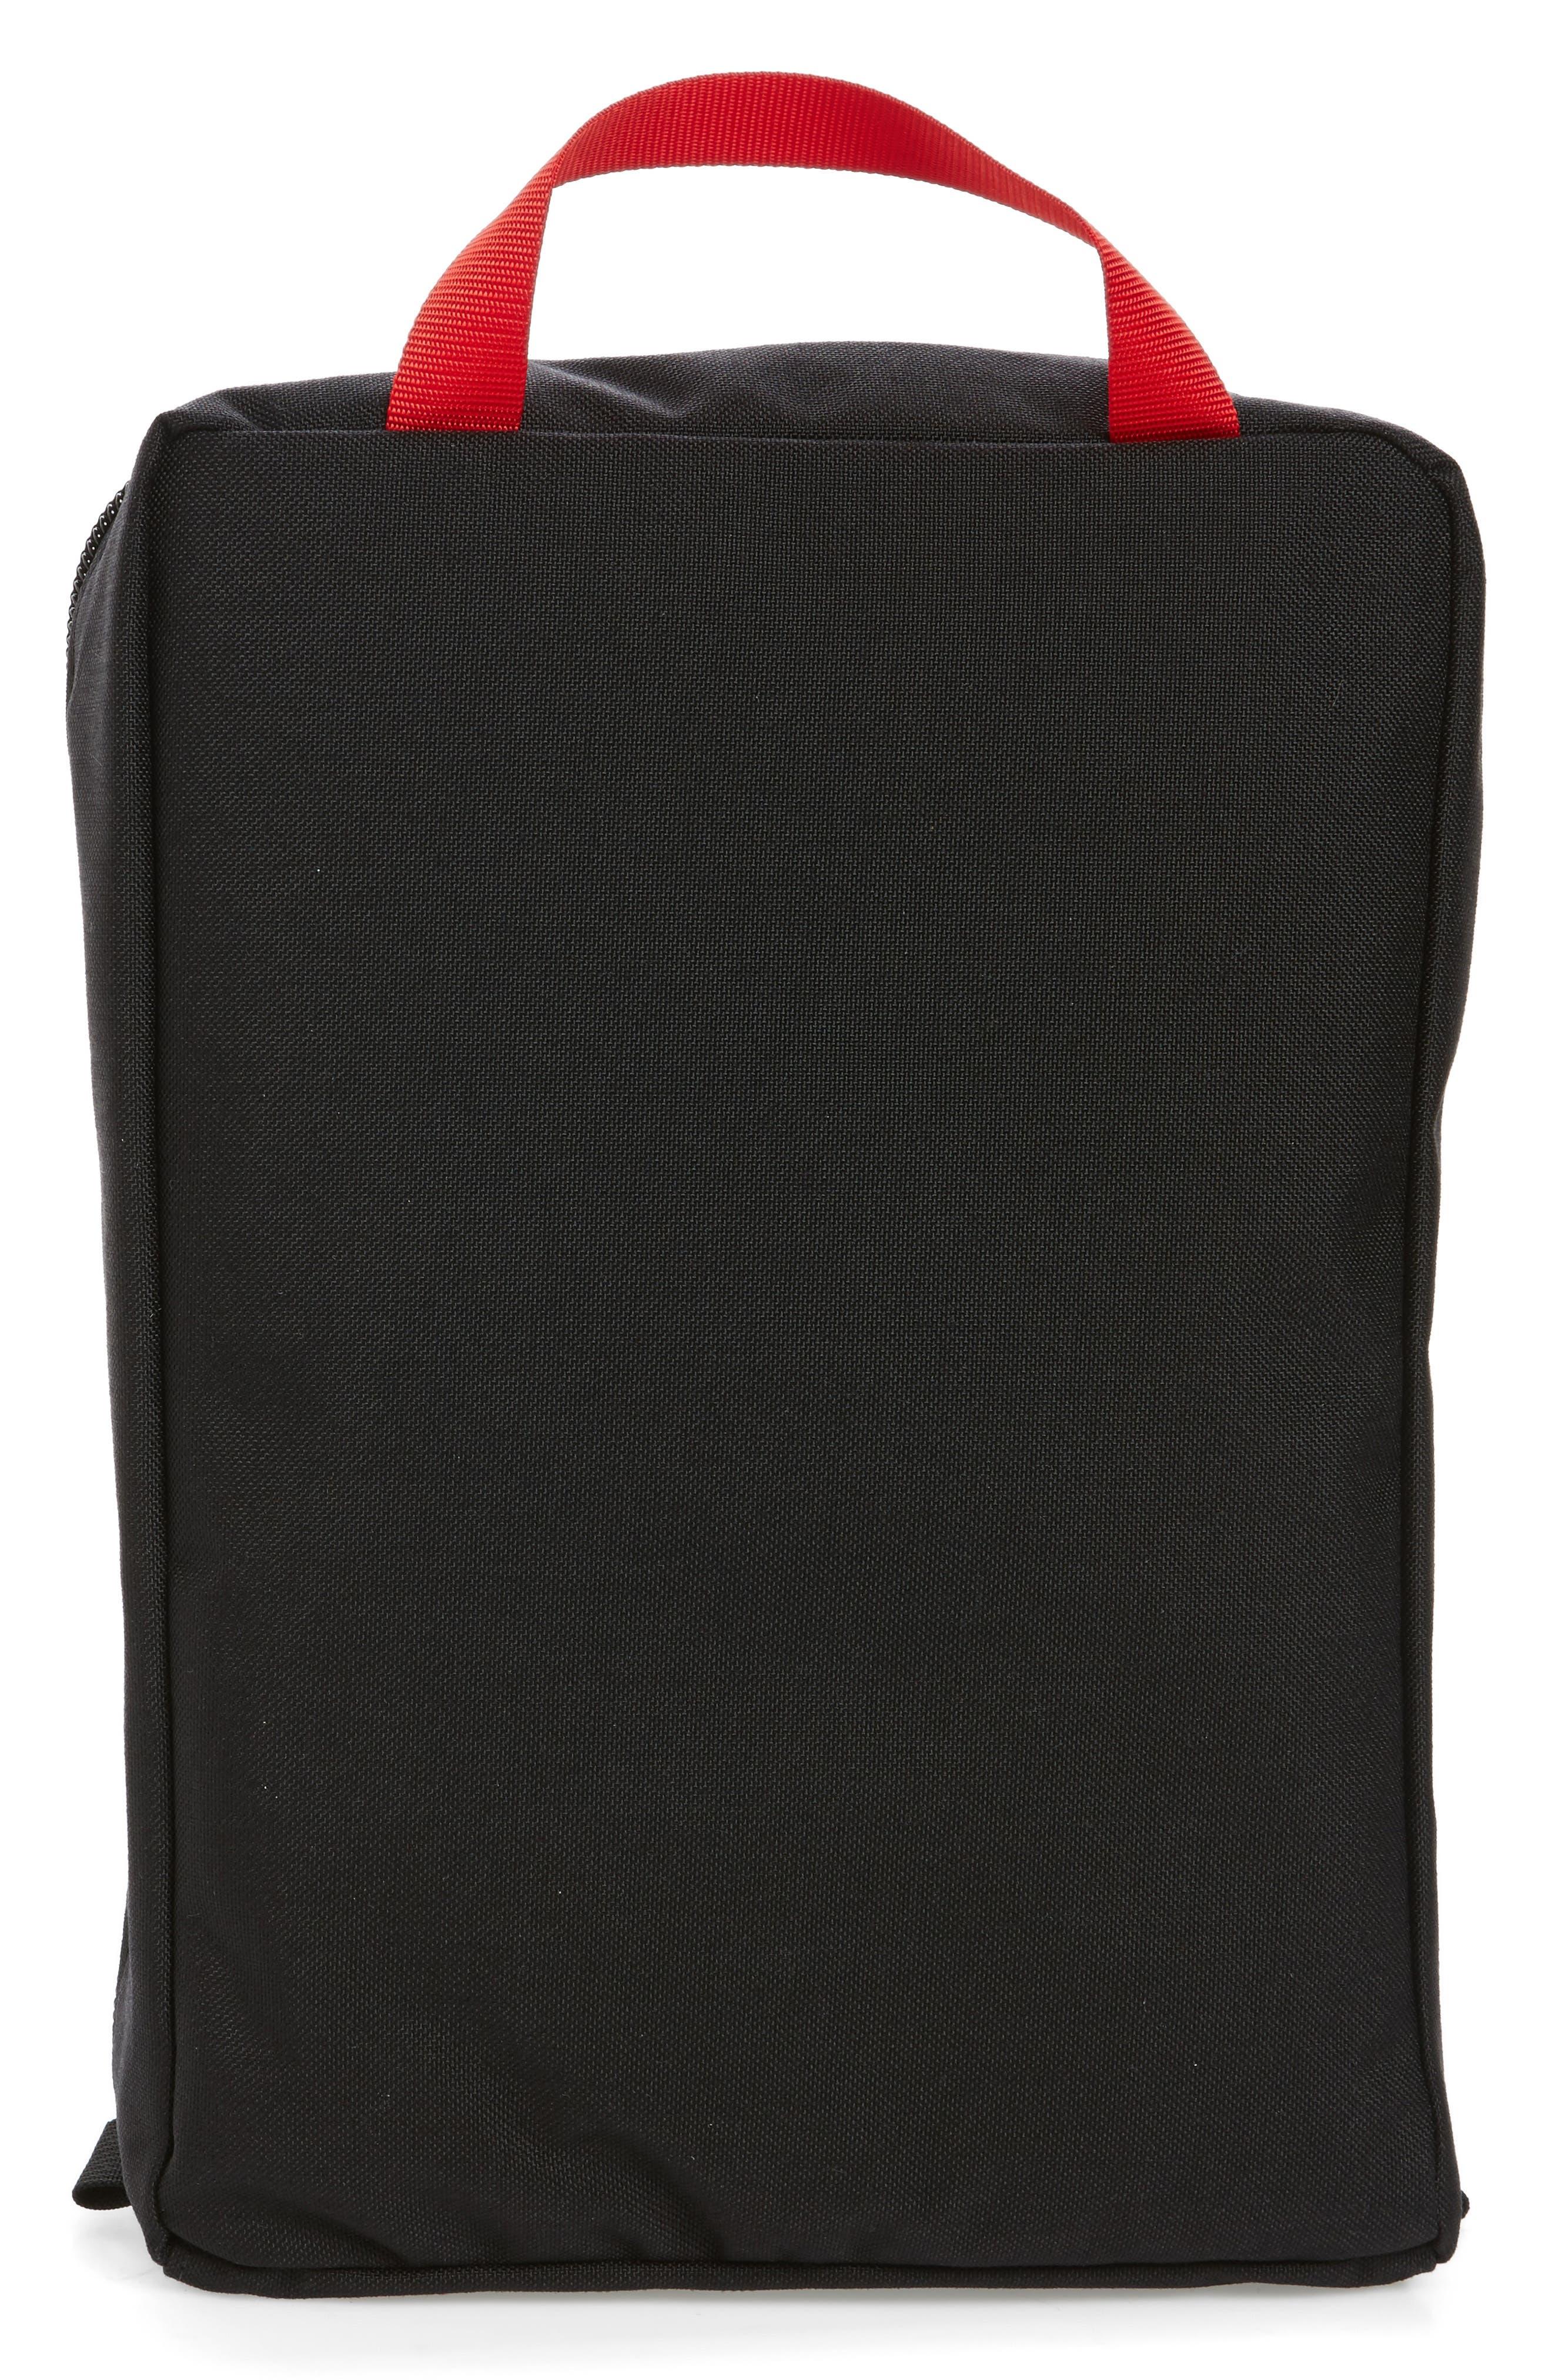 Alternate Image 2  - Topo Designs Pack Bags Tote